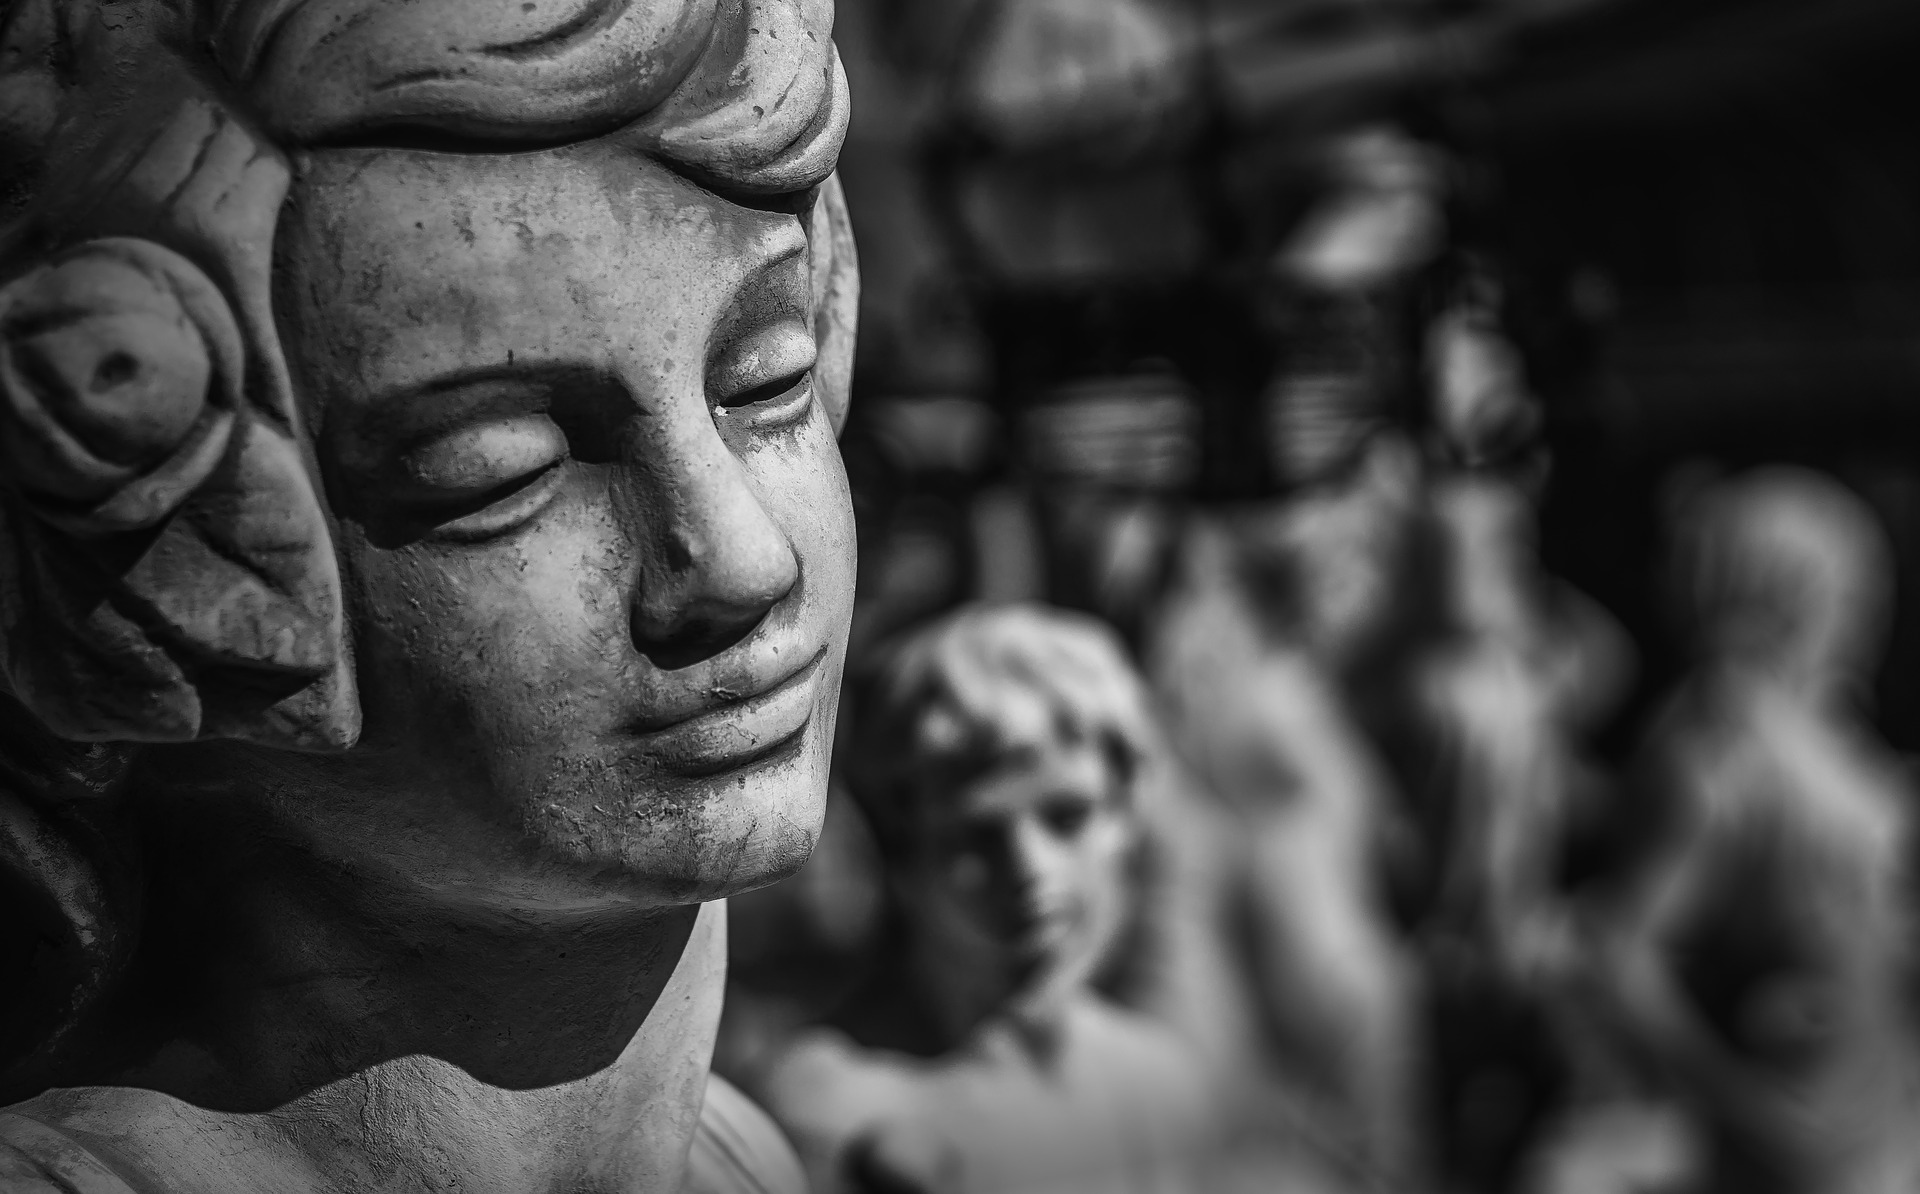 sculpture-2138140_1920